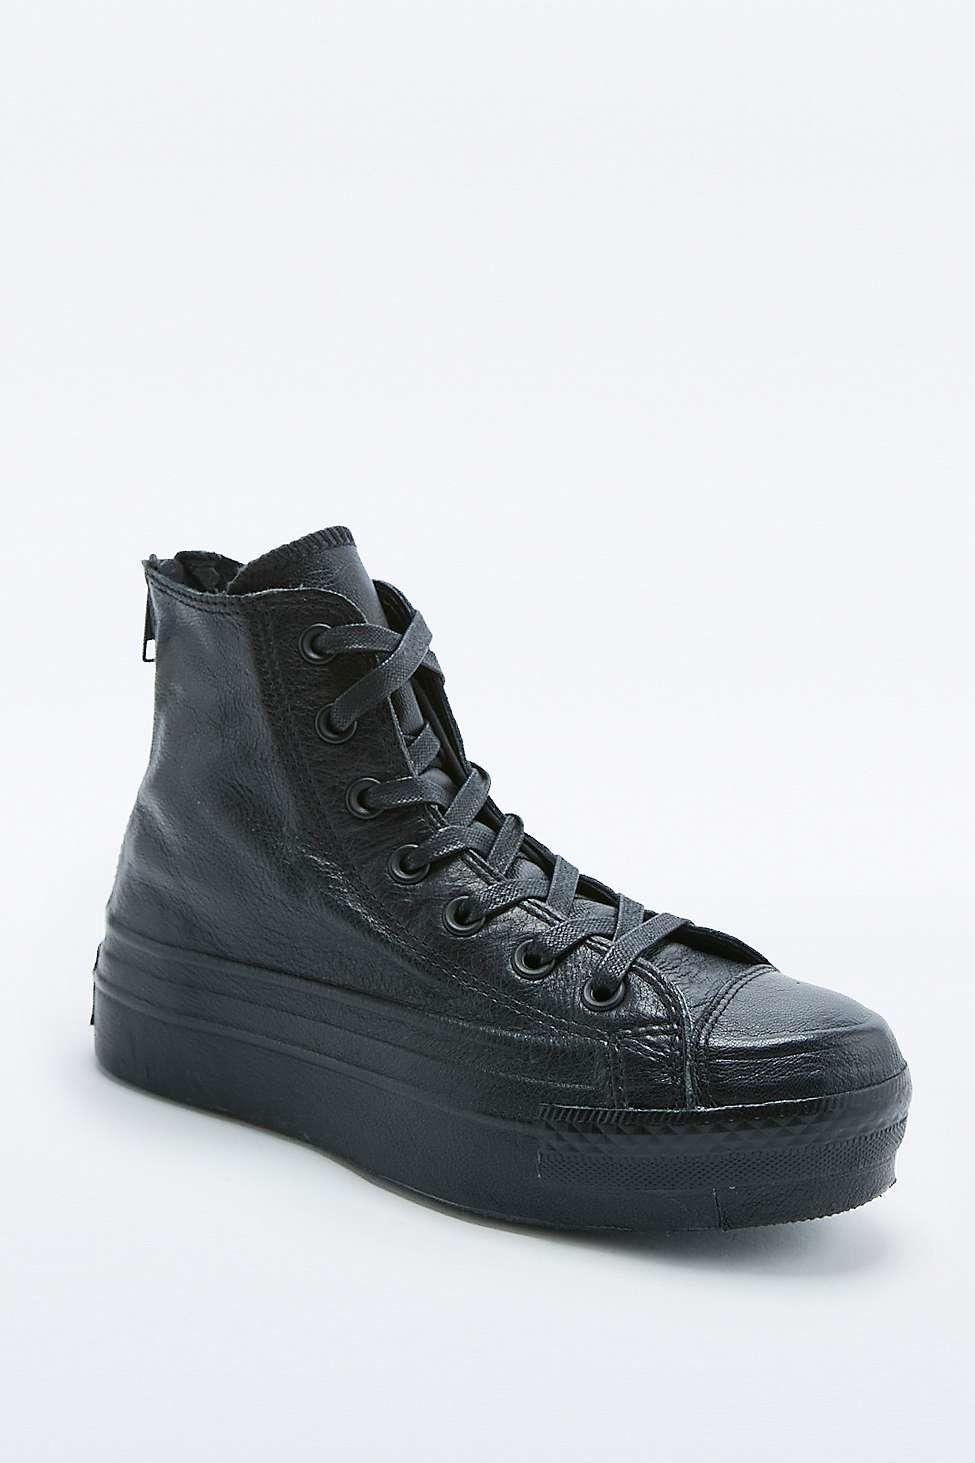 converse leather platform